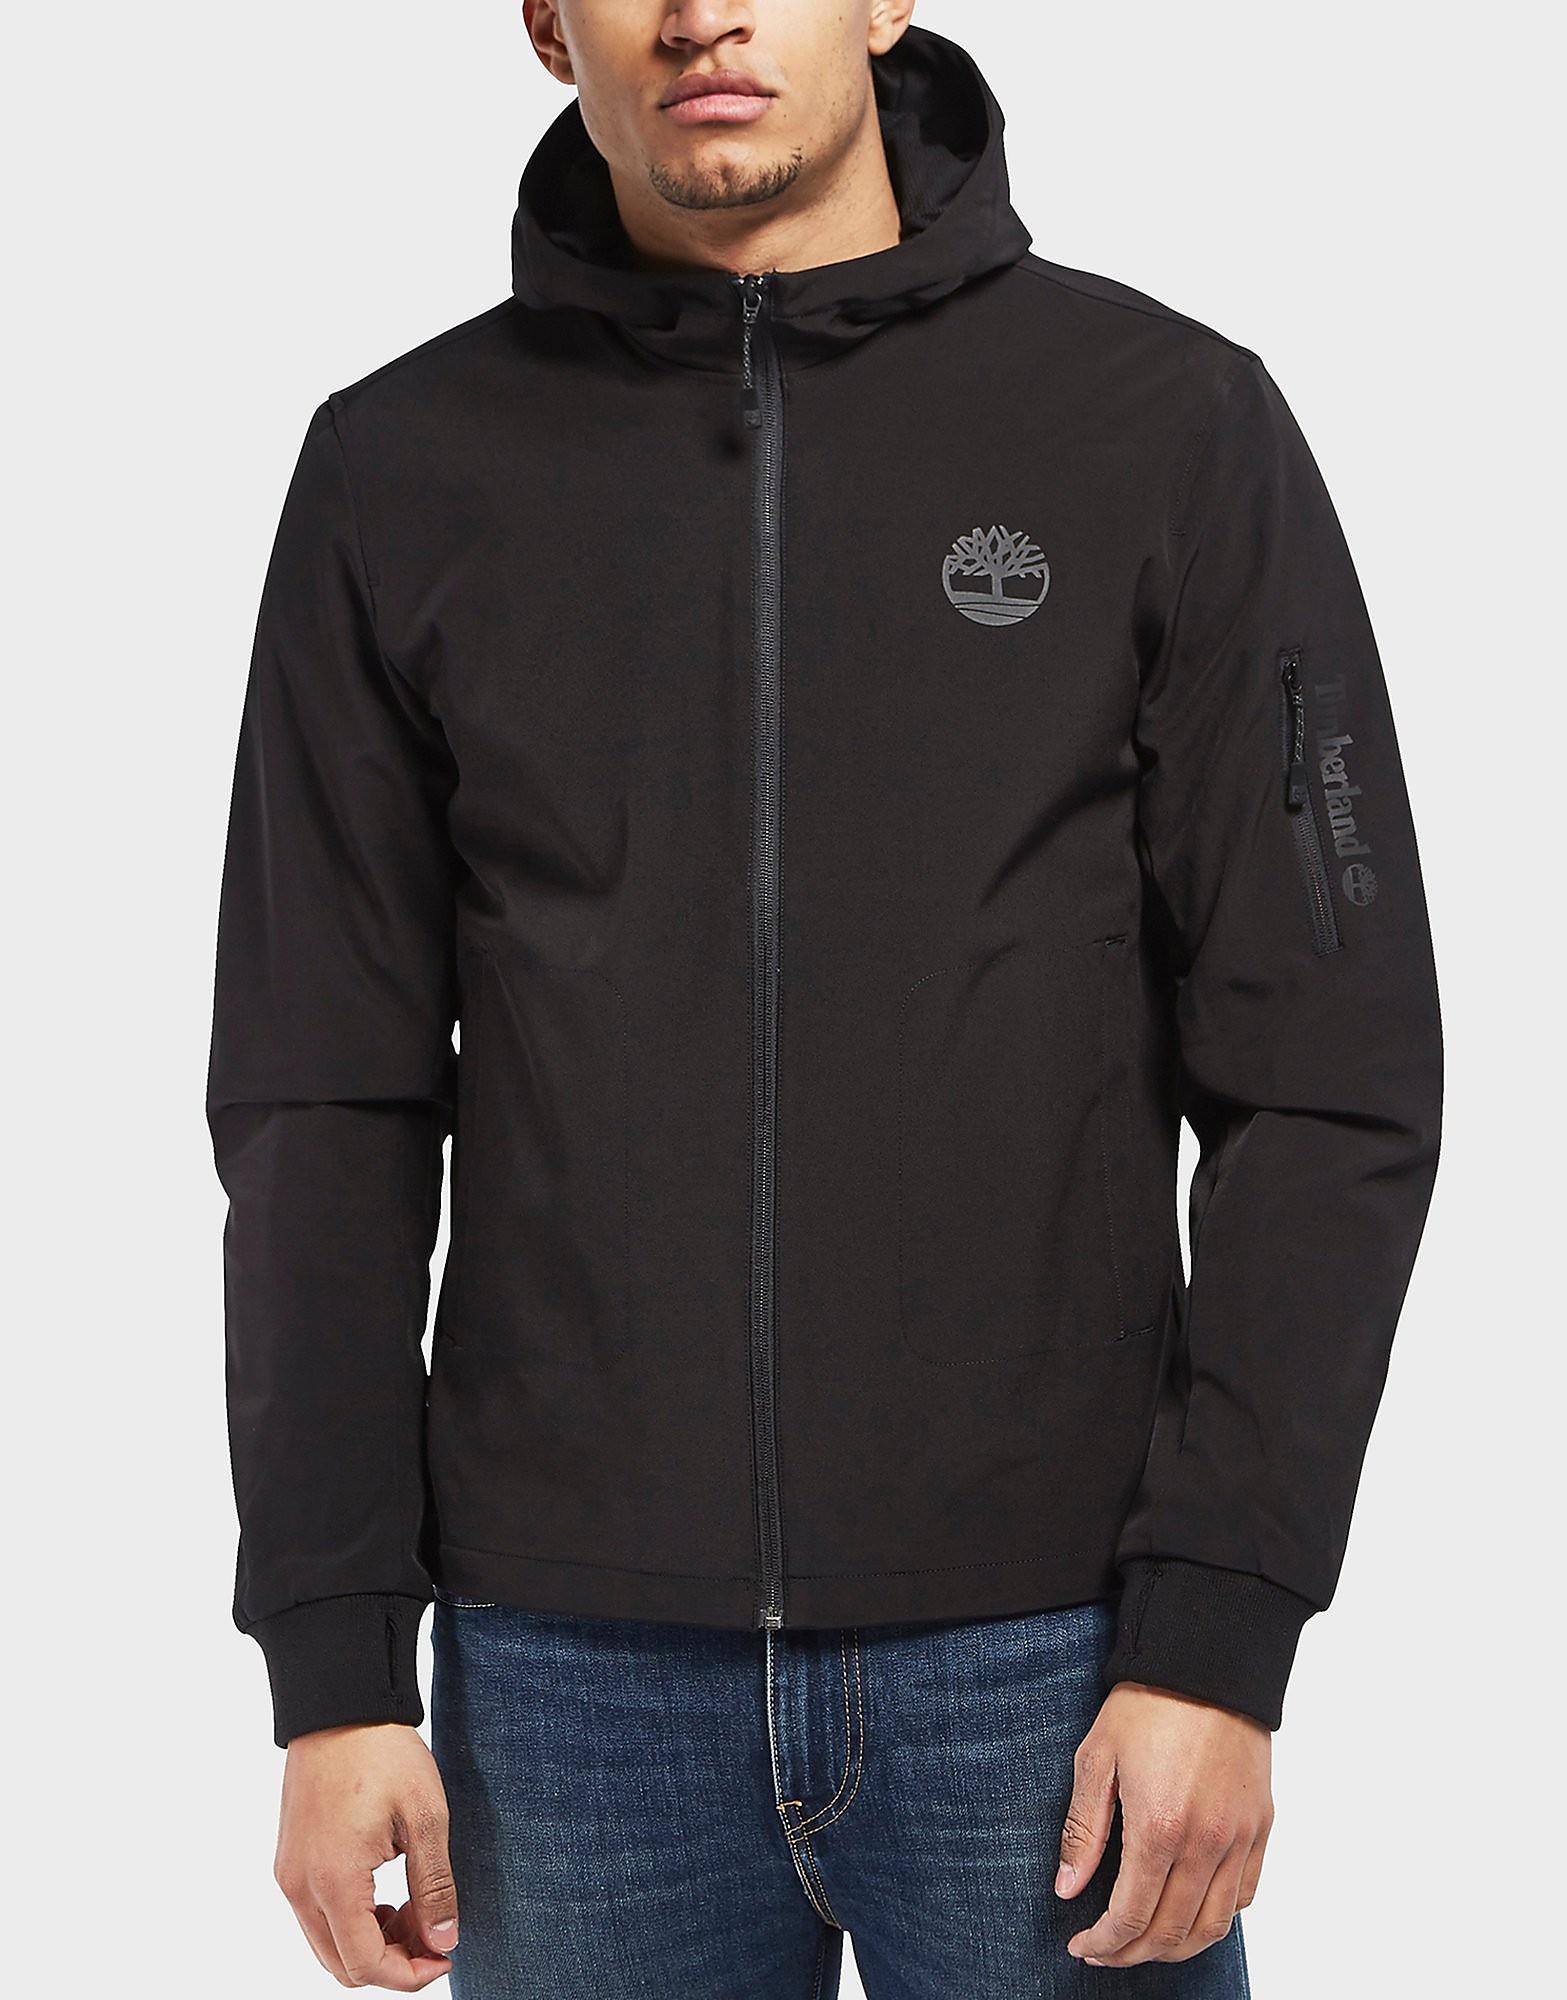 Timberland Full Zip Hooded Lightweight Softshell Jacket